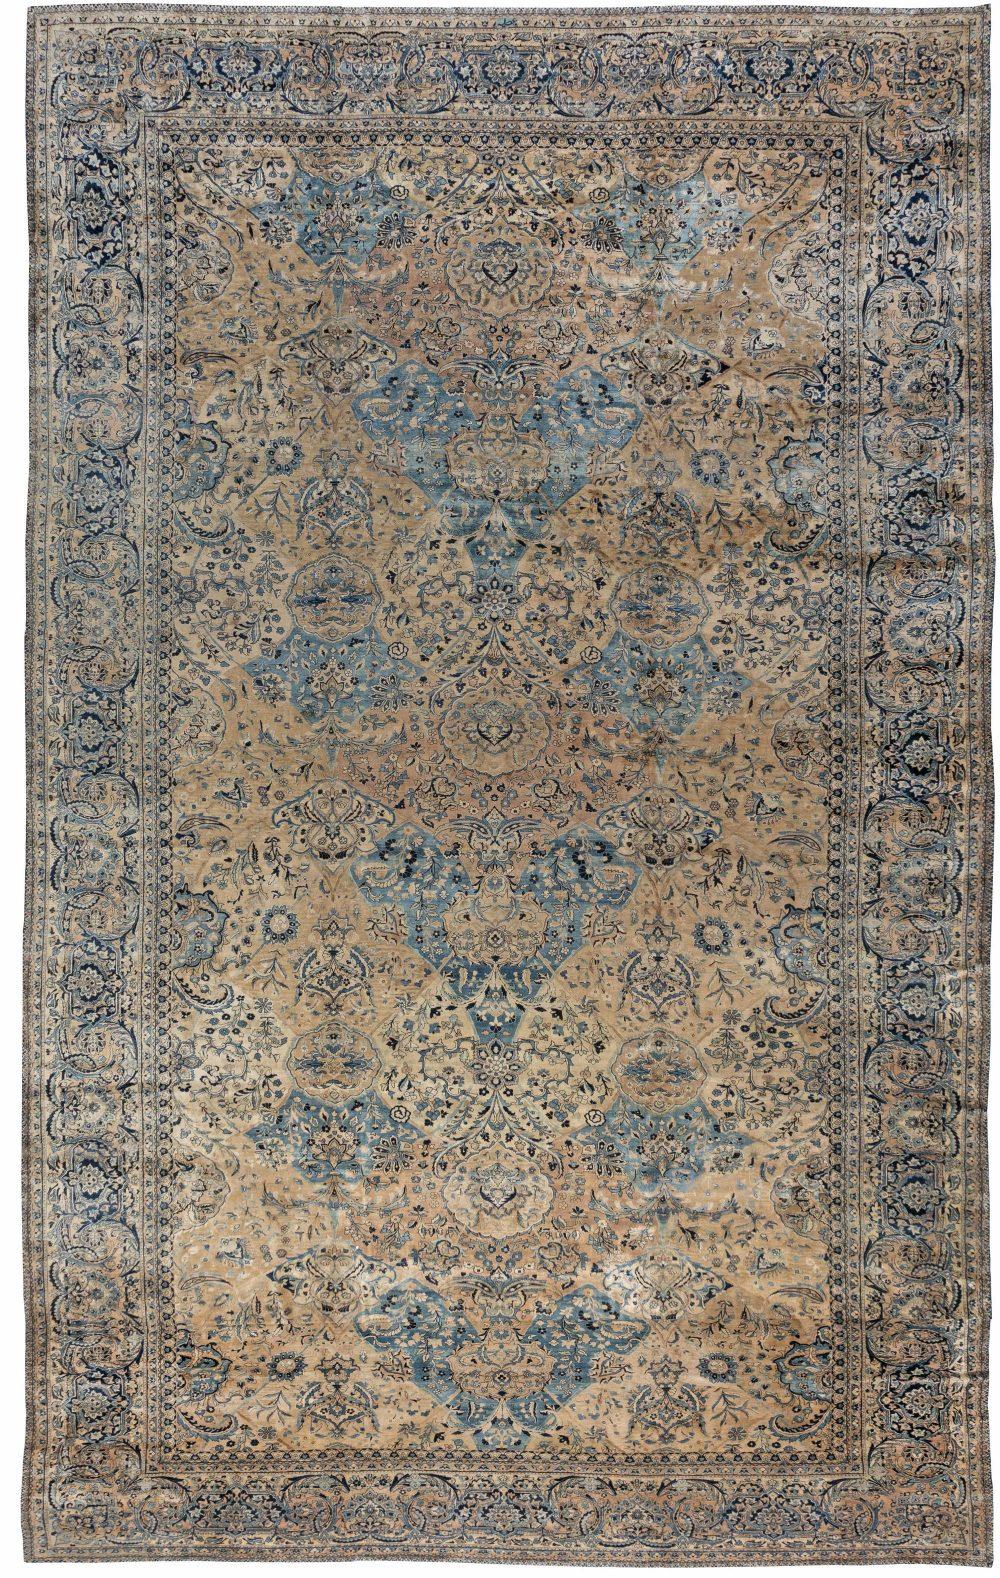 Antique Persian Kirman Rug BB6594